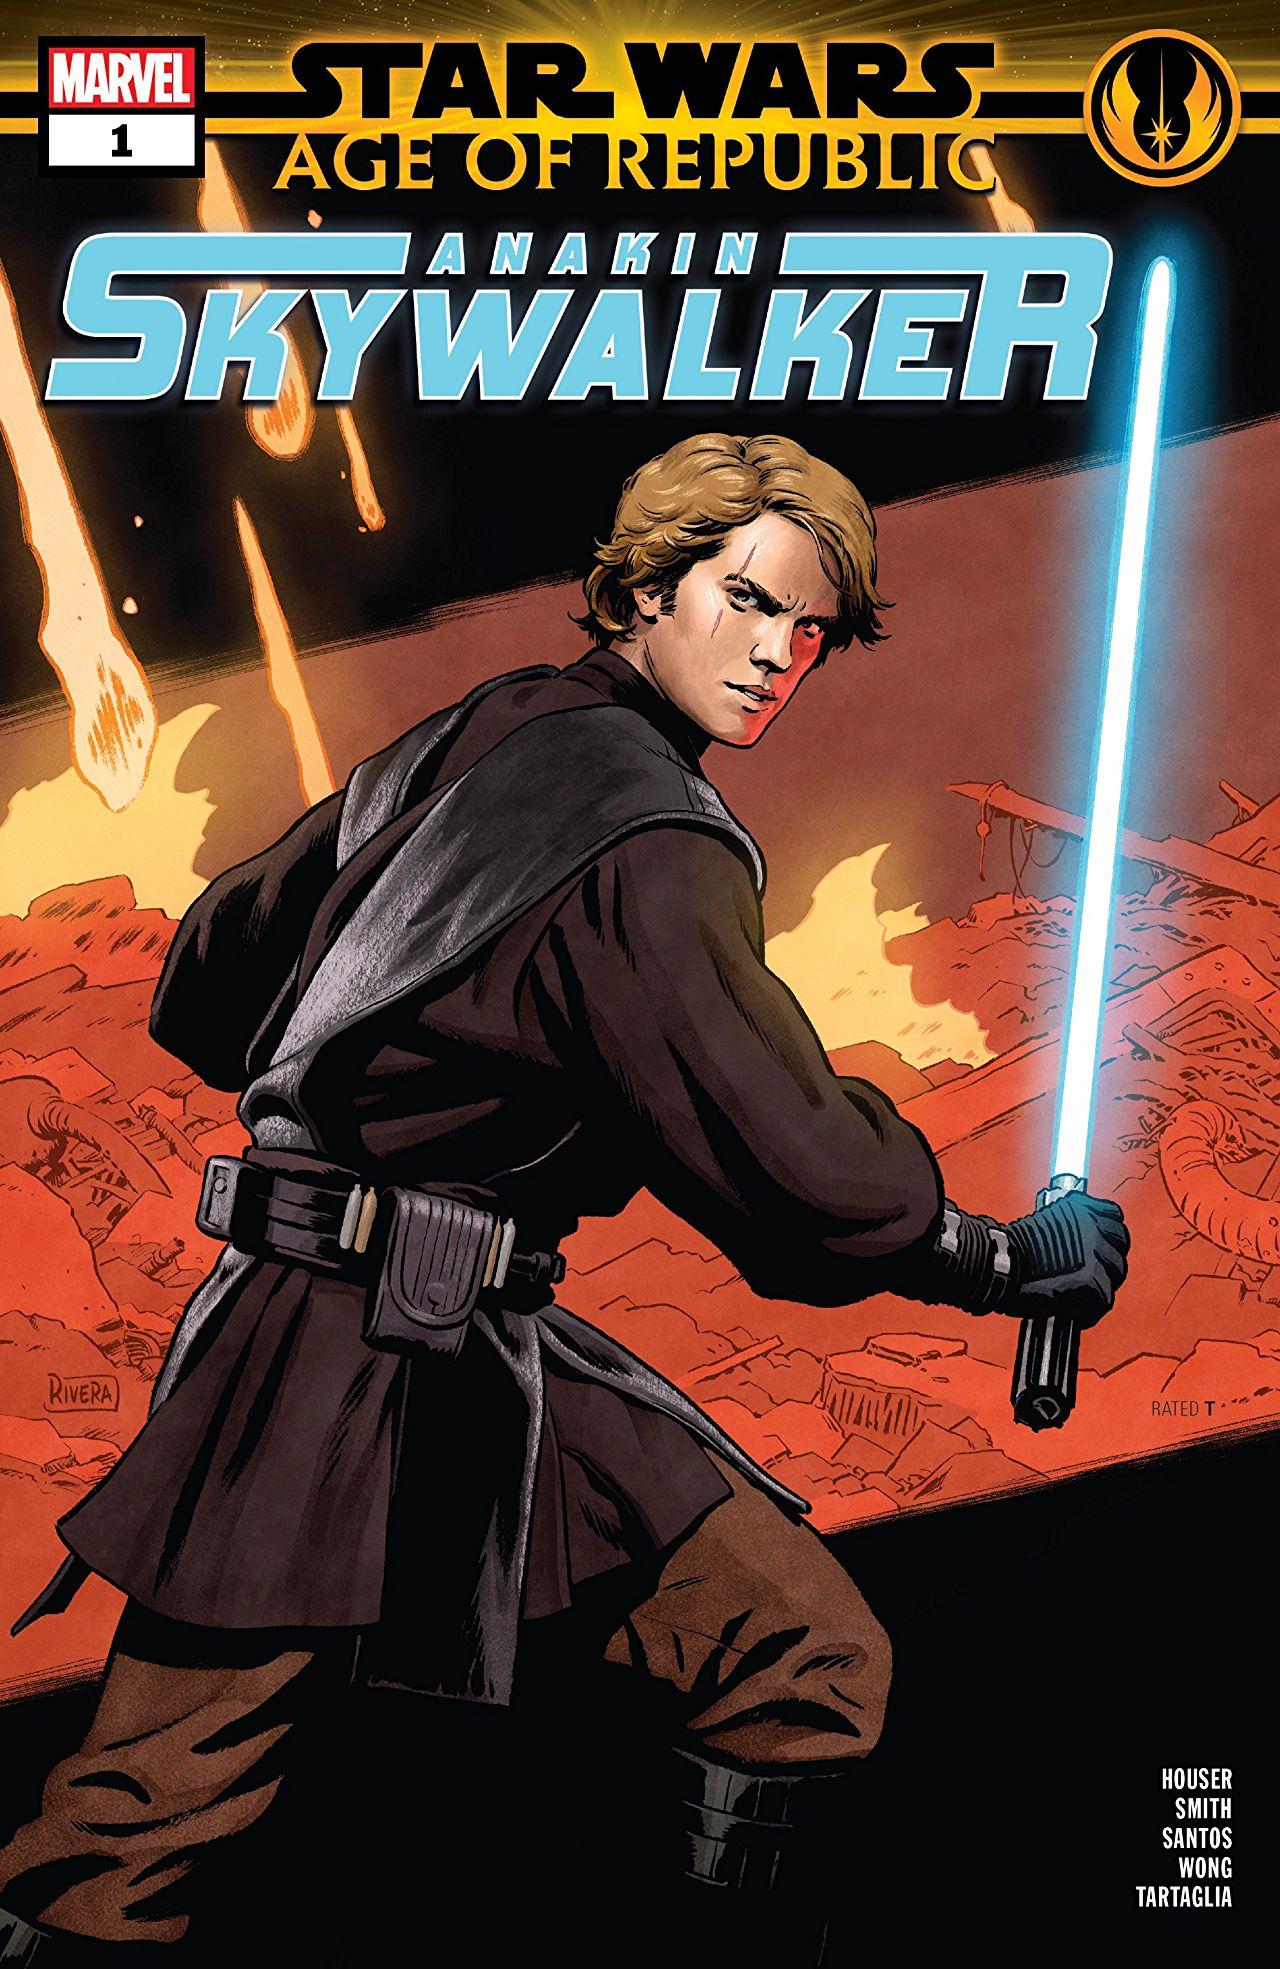 Star Wars: Age of Republic - Anakin Skywalker Vol 1 1